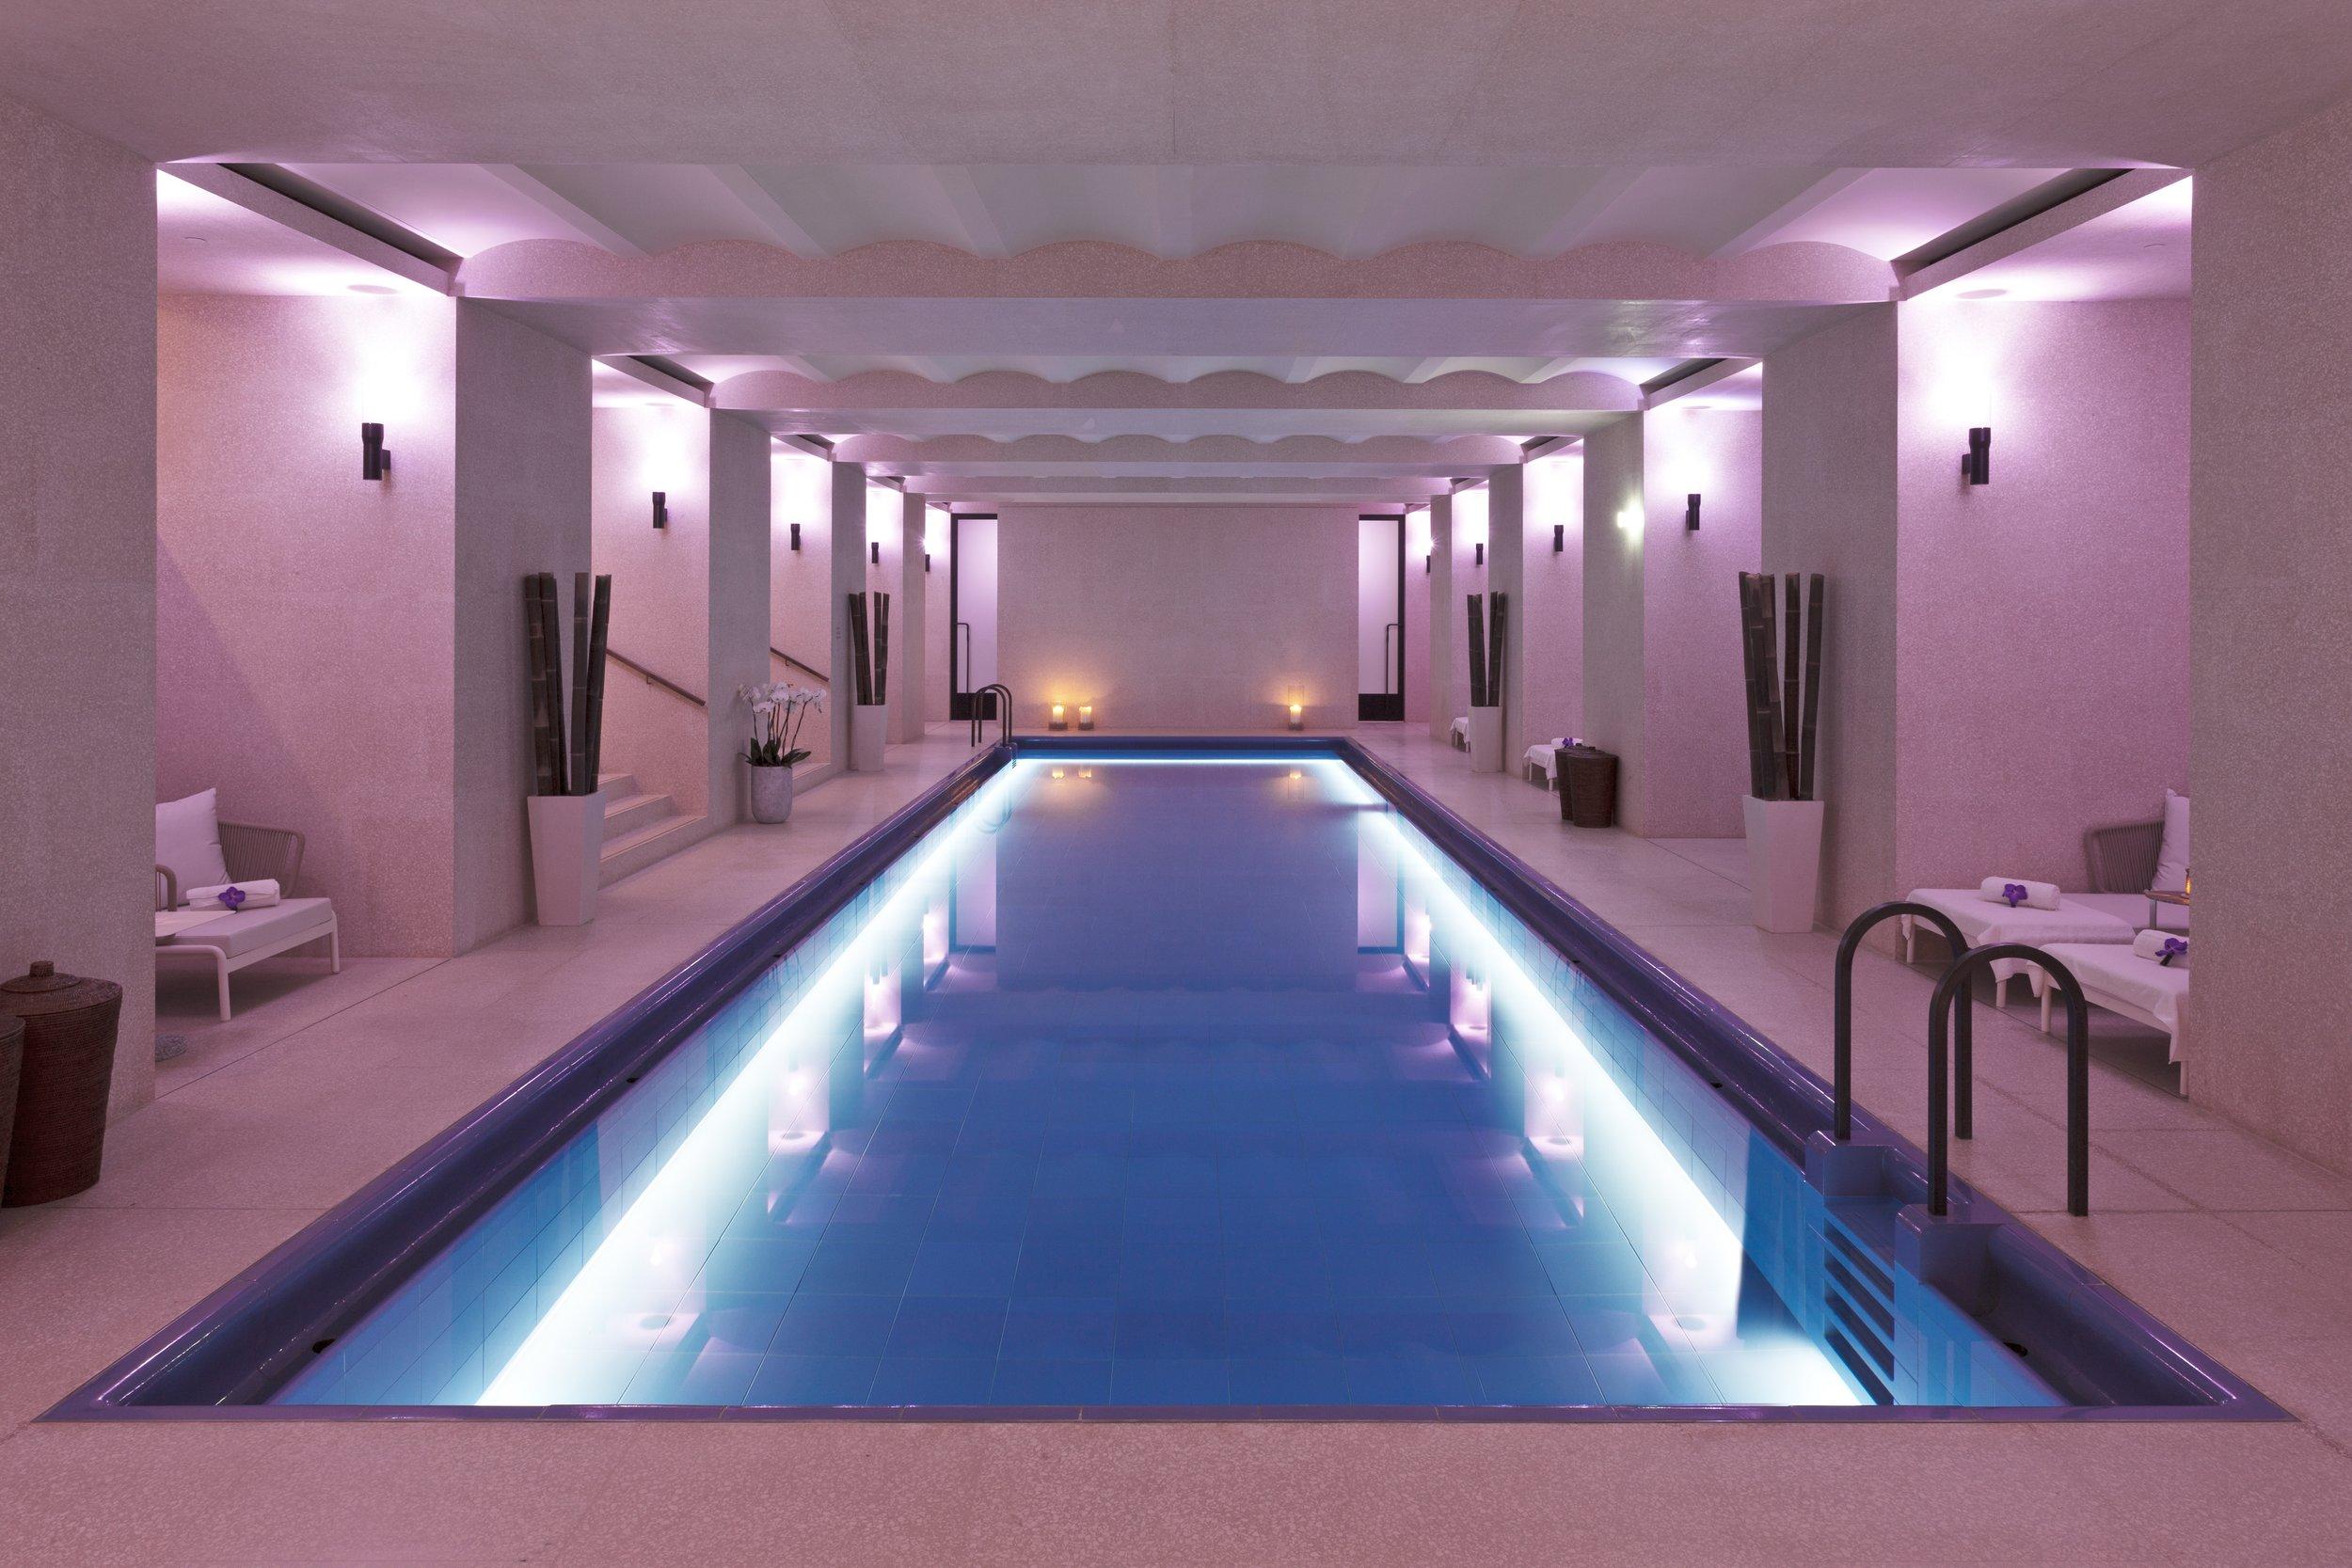 Hotel Cafe Royal - Akasha - Swimming Pool3.jpg